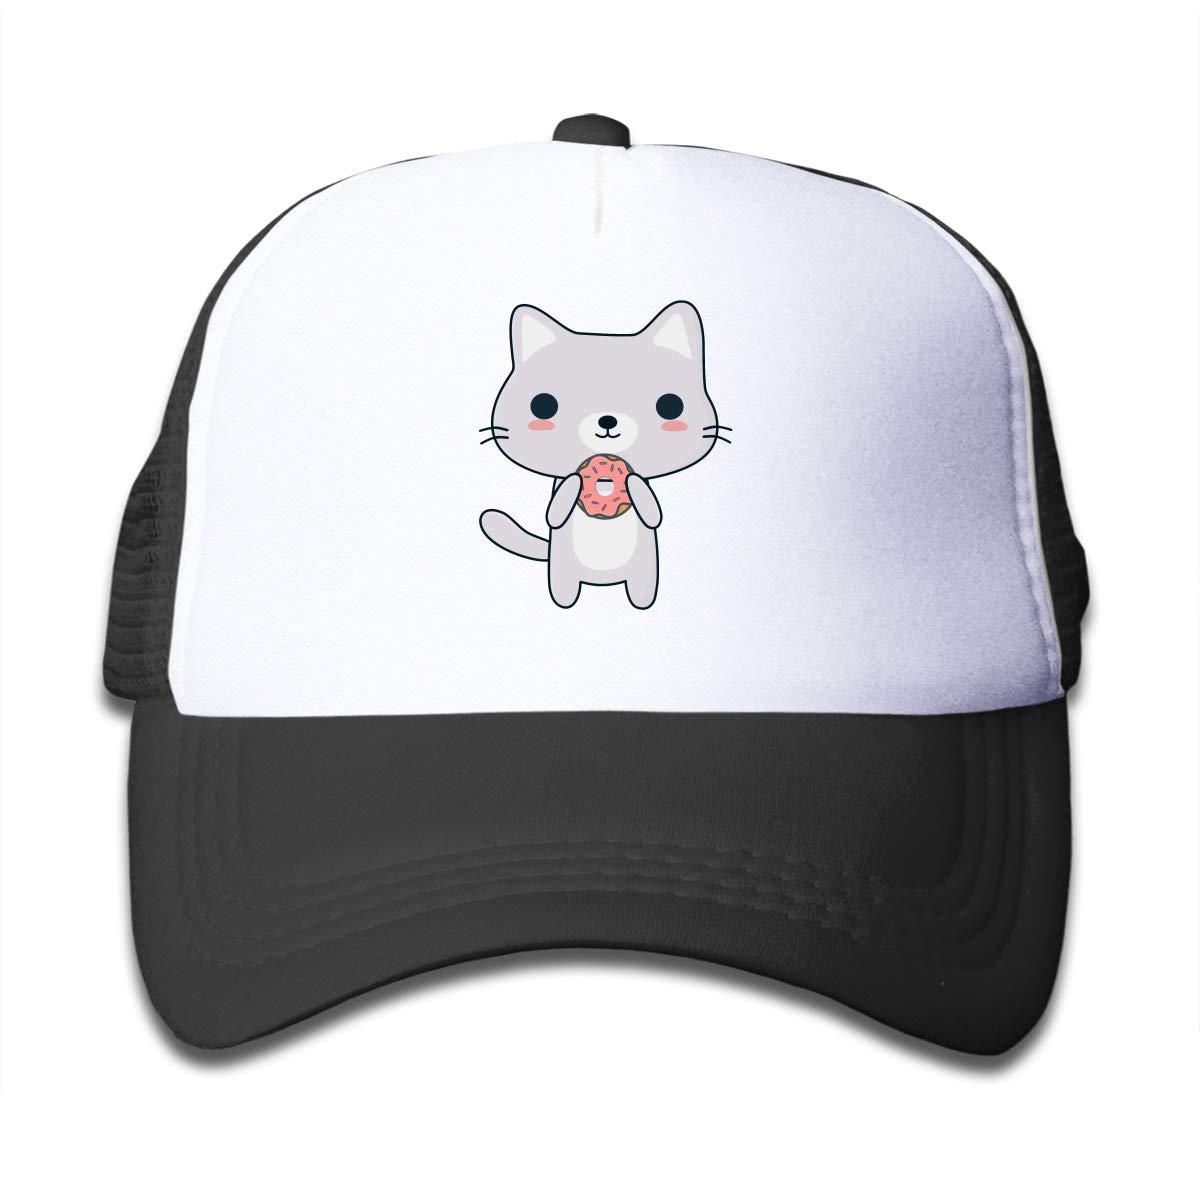 Kawaii Cat Eating A Donut Children Hip Hop Caps Hat Black